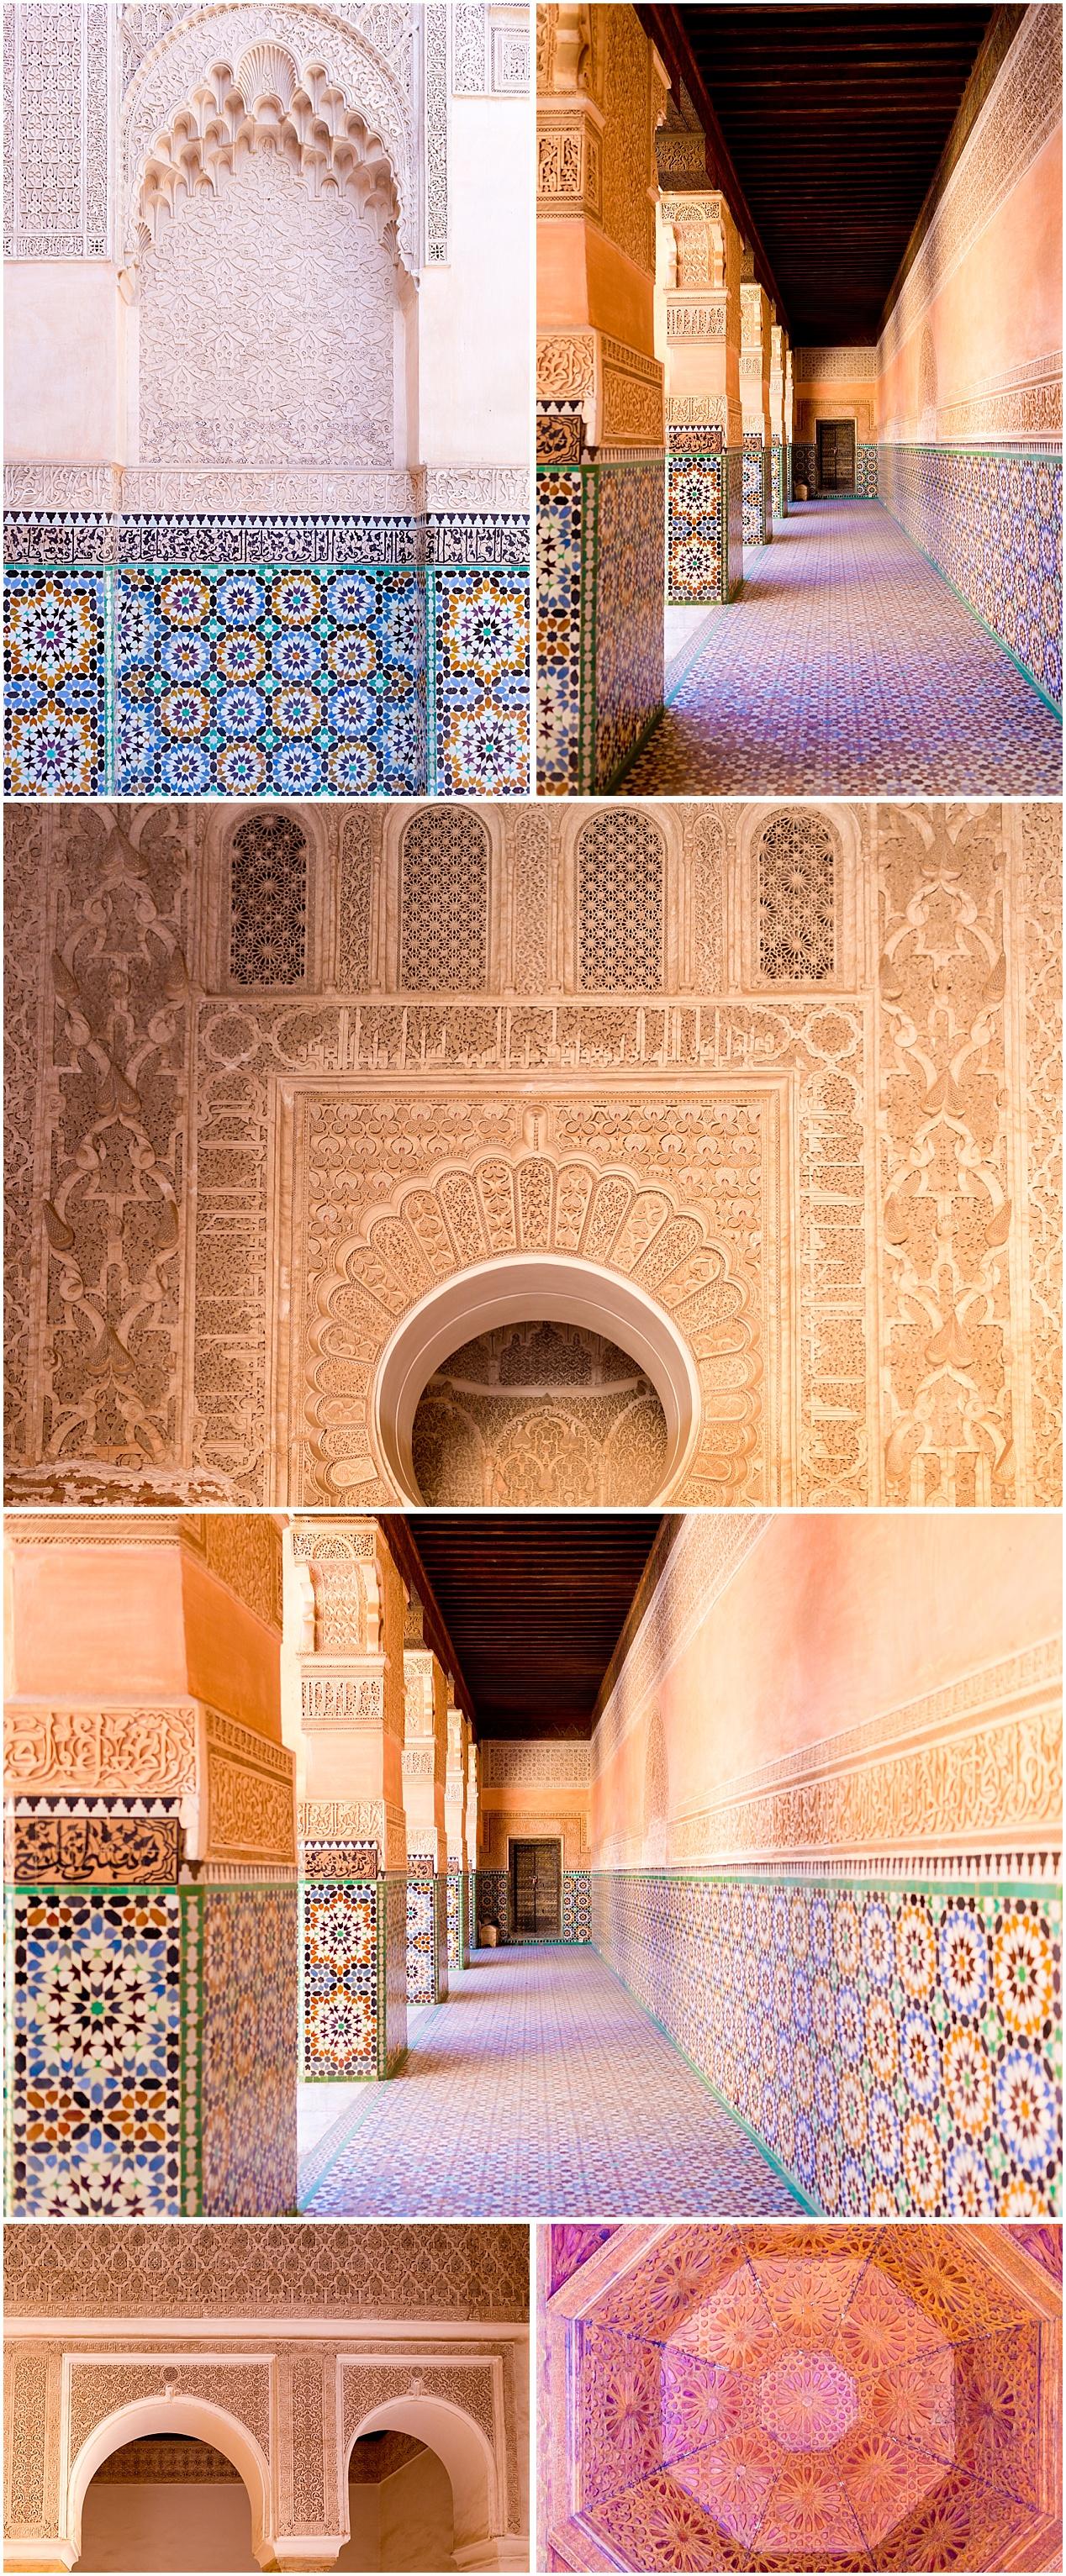 corridors, woodwork, and mosaic tile at Medersa Ben Youssef (Marrakech travel blog)